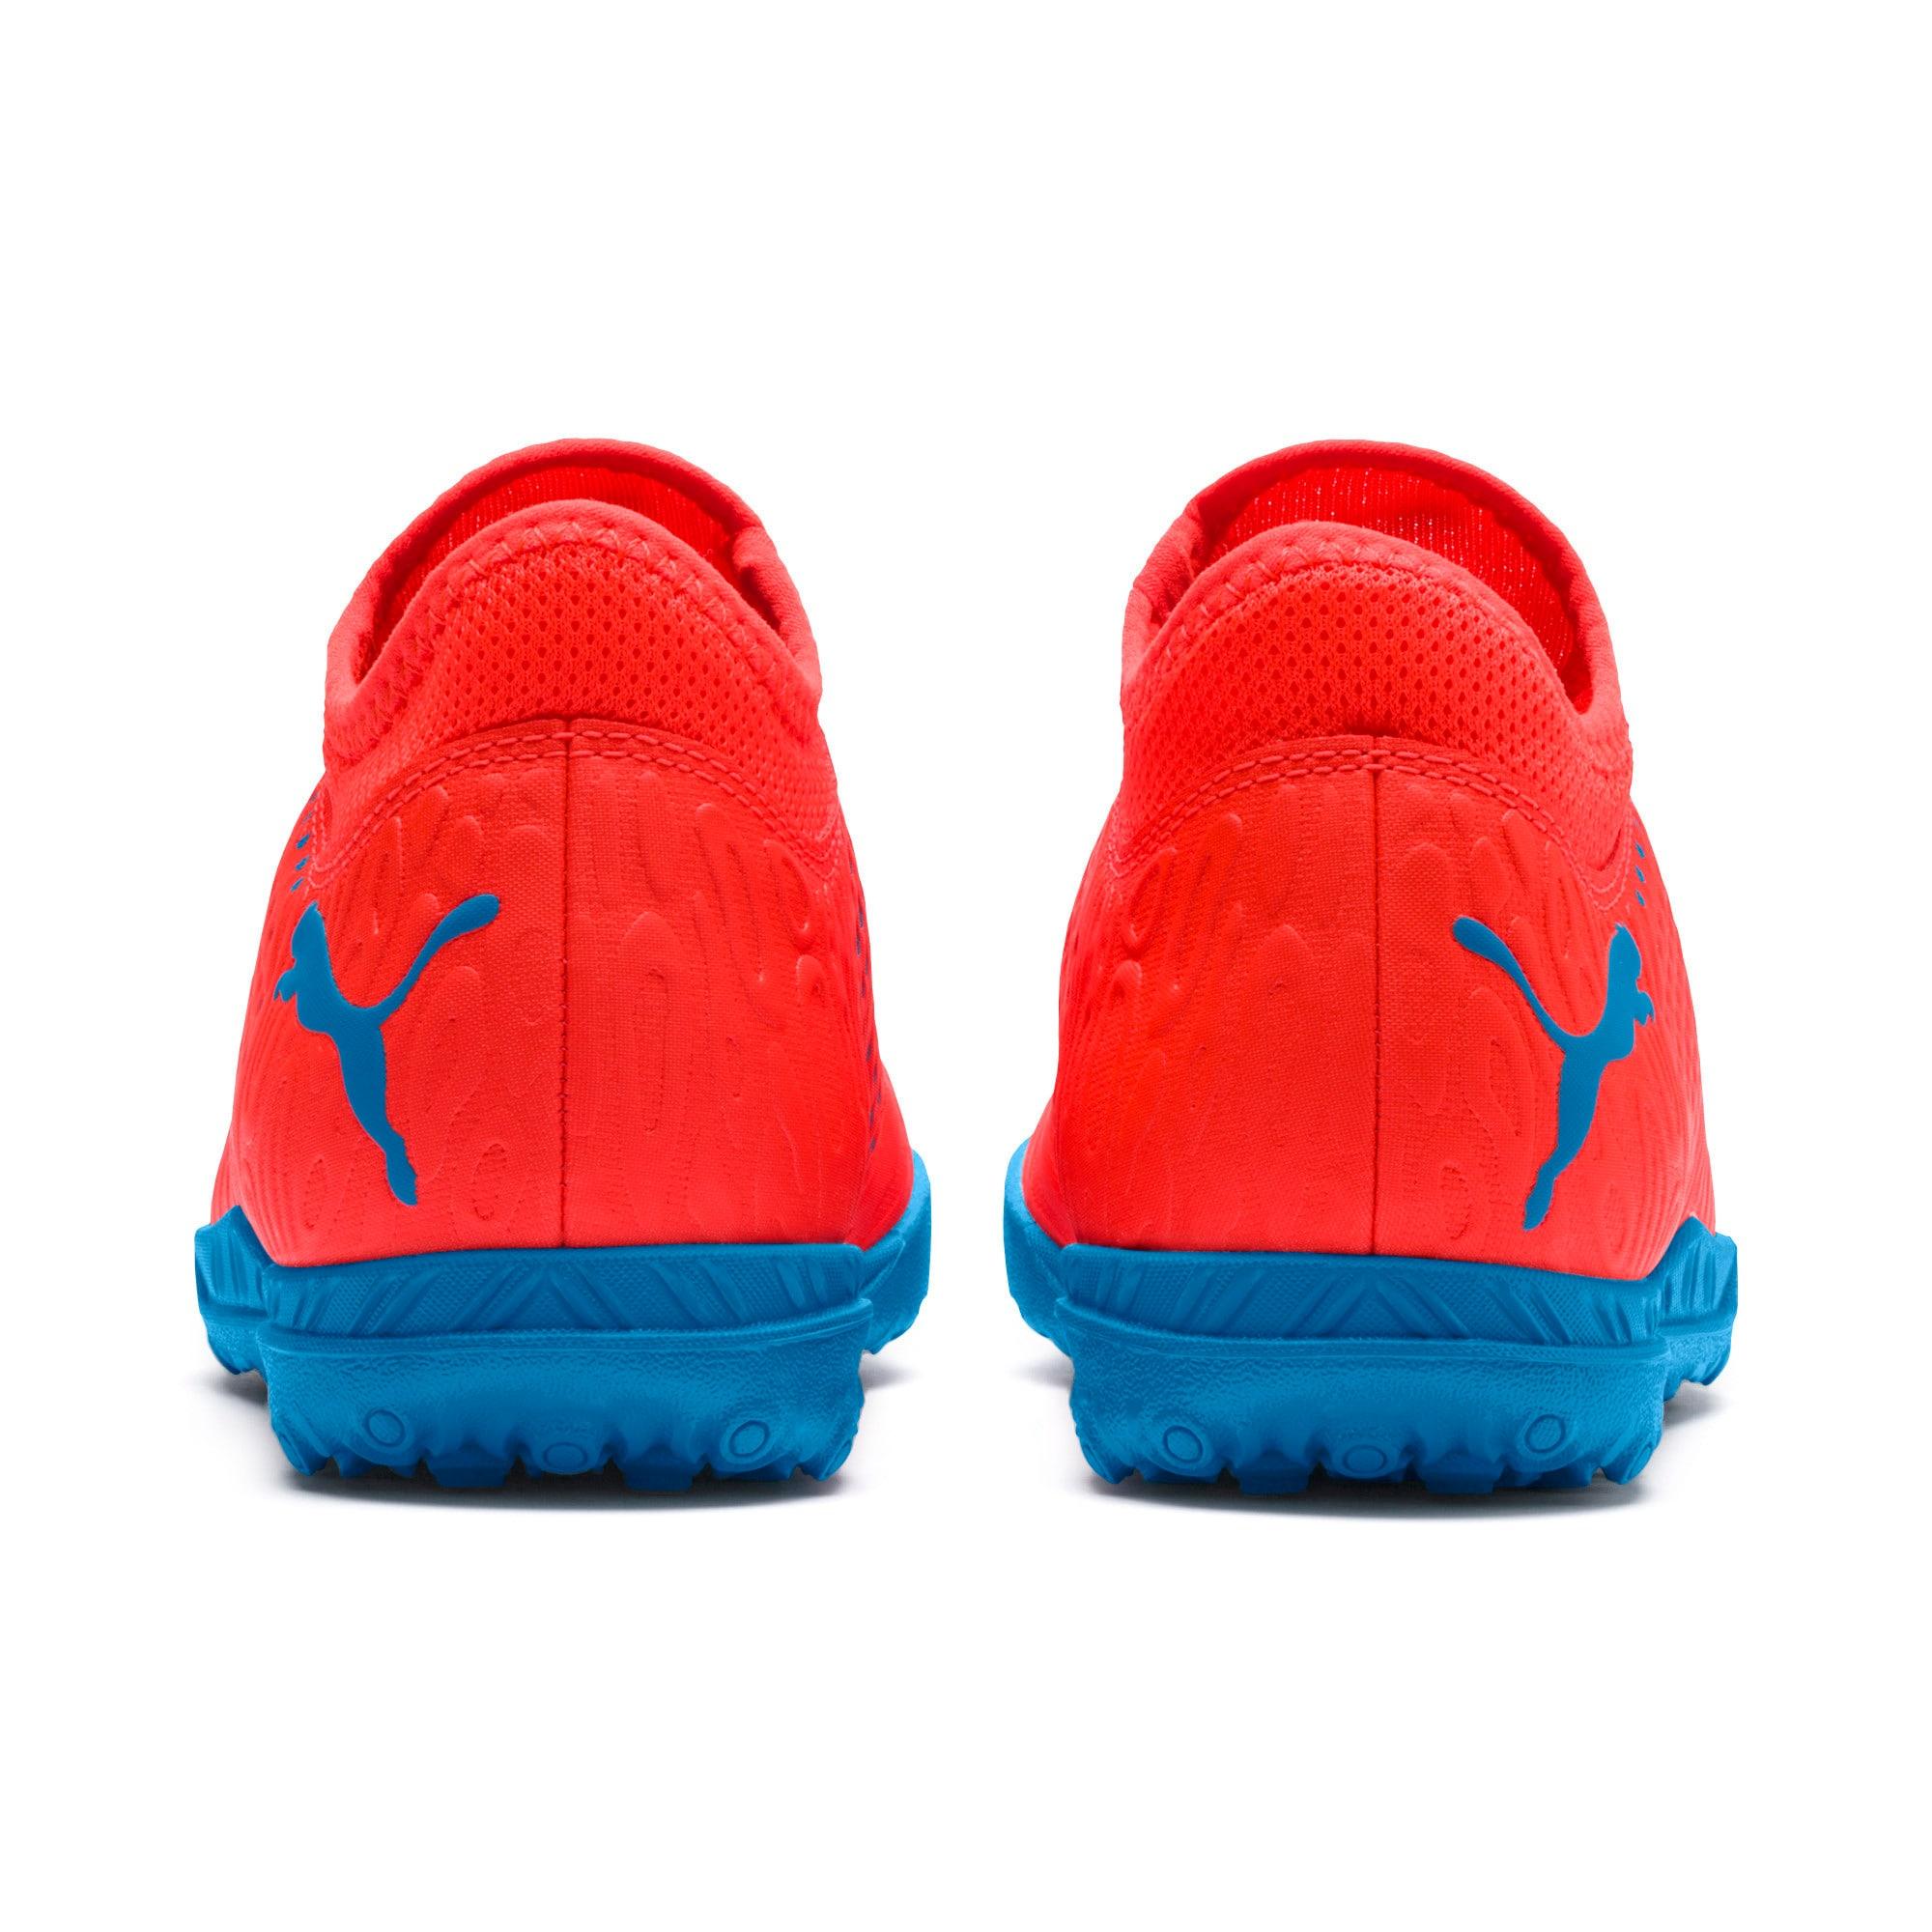 Thumbnail 3 of FUTURE 19.4 TT Soccer Shoes JR, Red Blast-Bleu Azur, medium